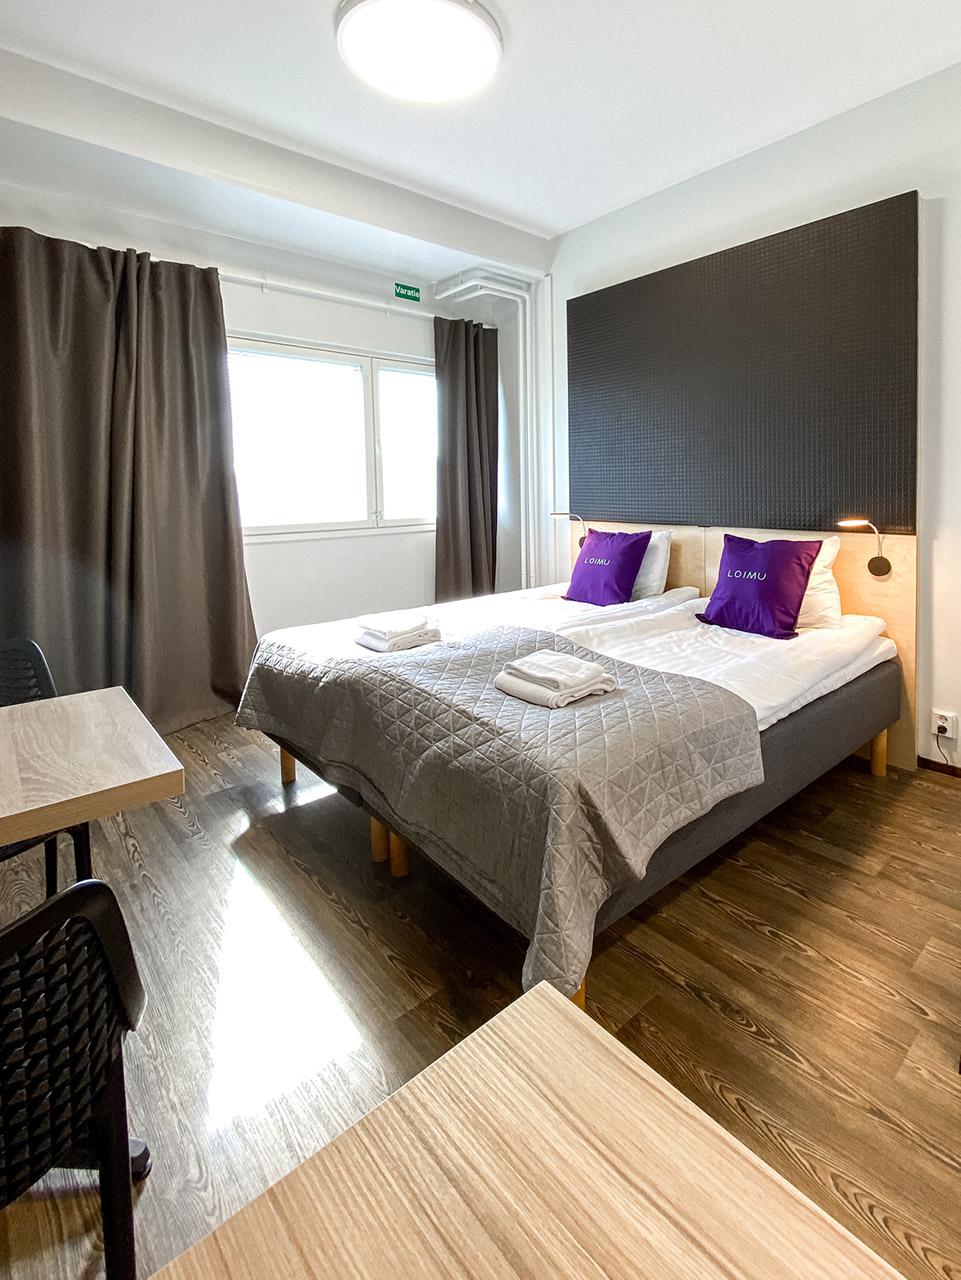 Hotelli Loimu Raisio - 2 hengen huone